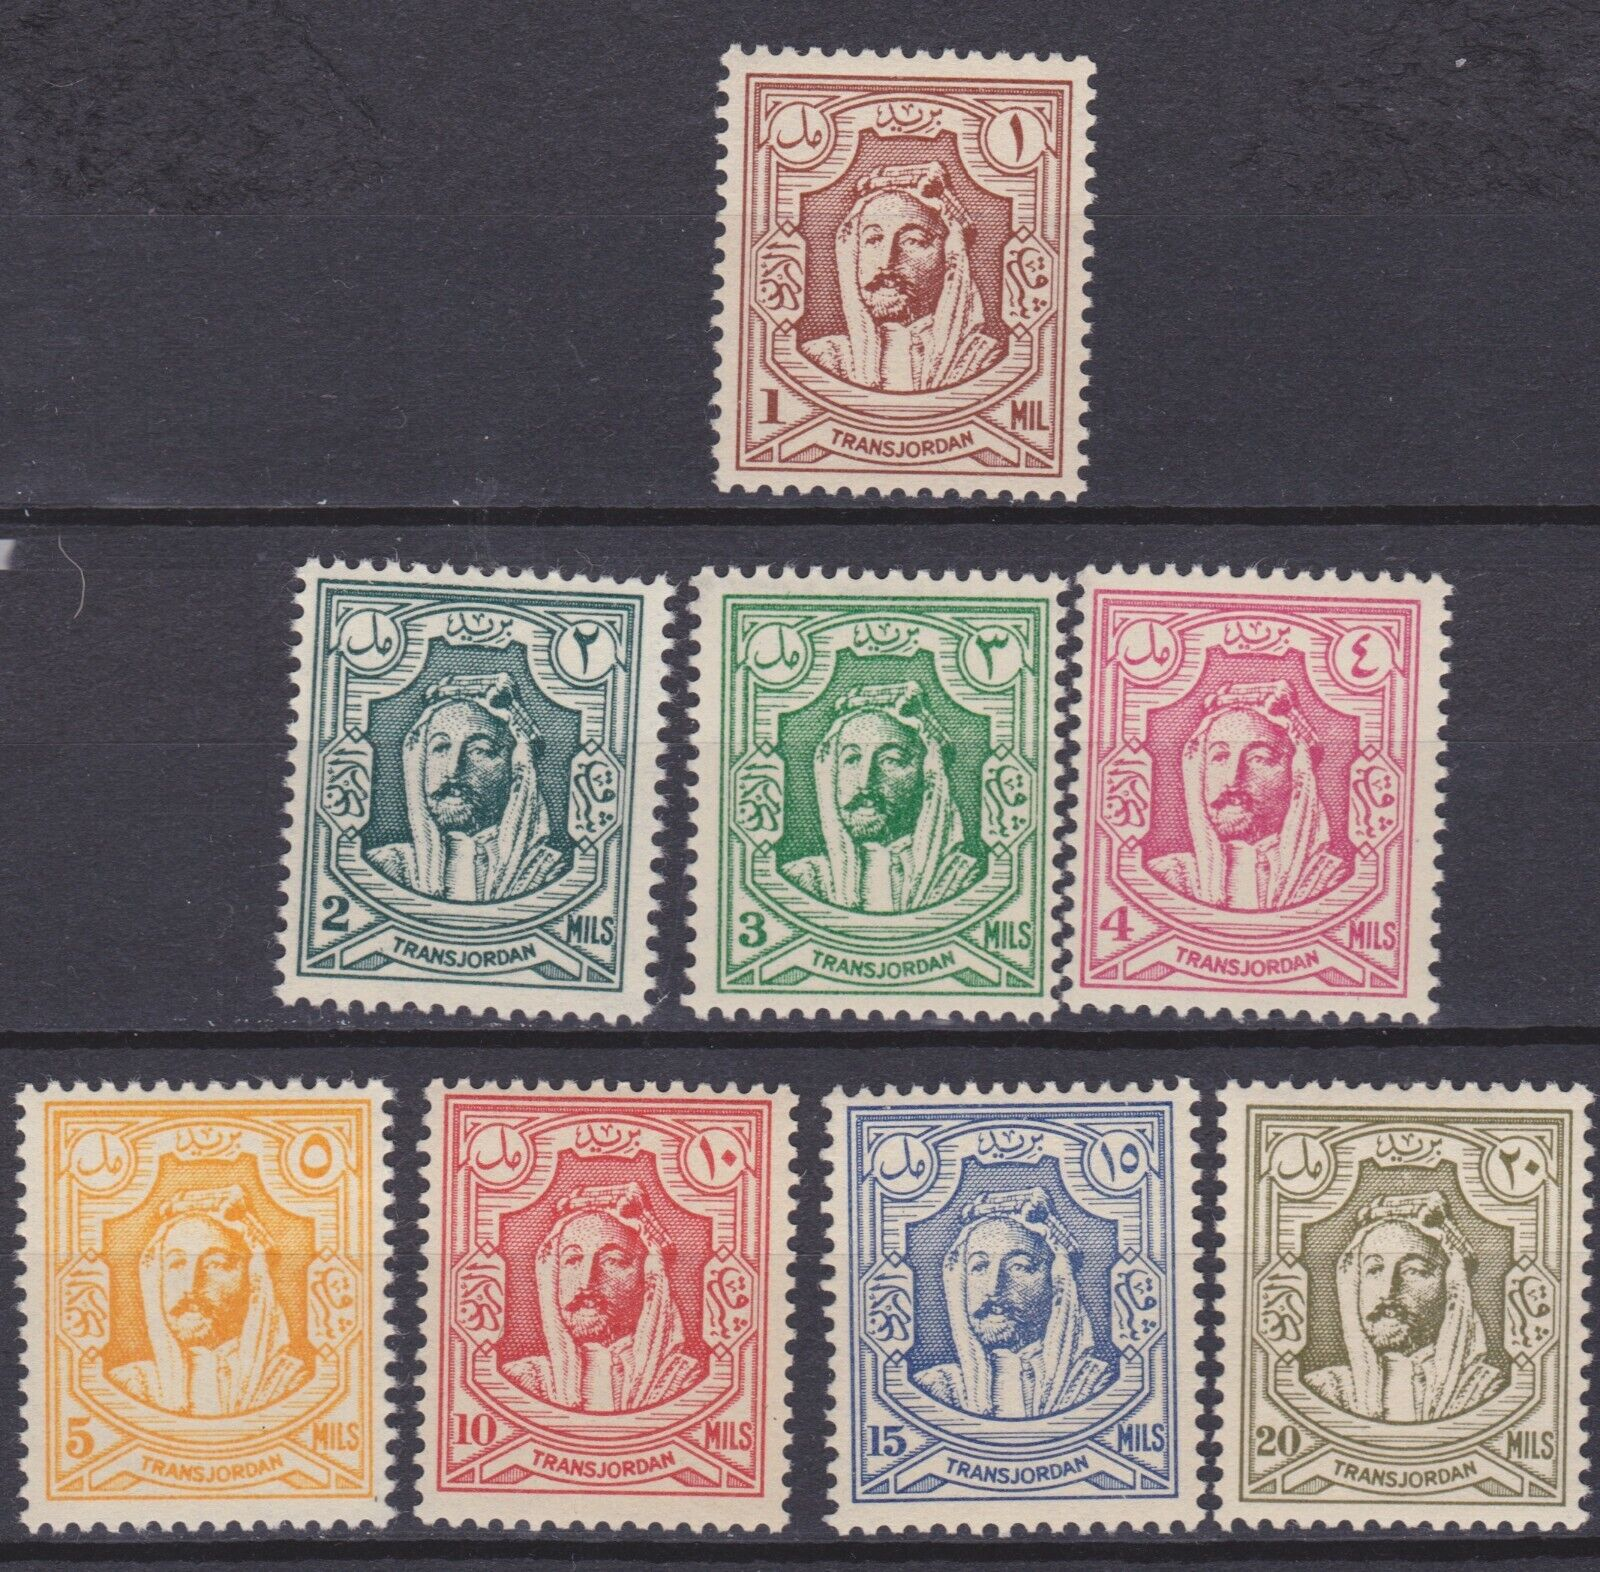 Transjordan Jordan 1942, Emir Abdullah 1, Cairo Print, MNH SG 222/9 Value 53 - $13.99